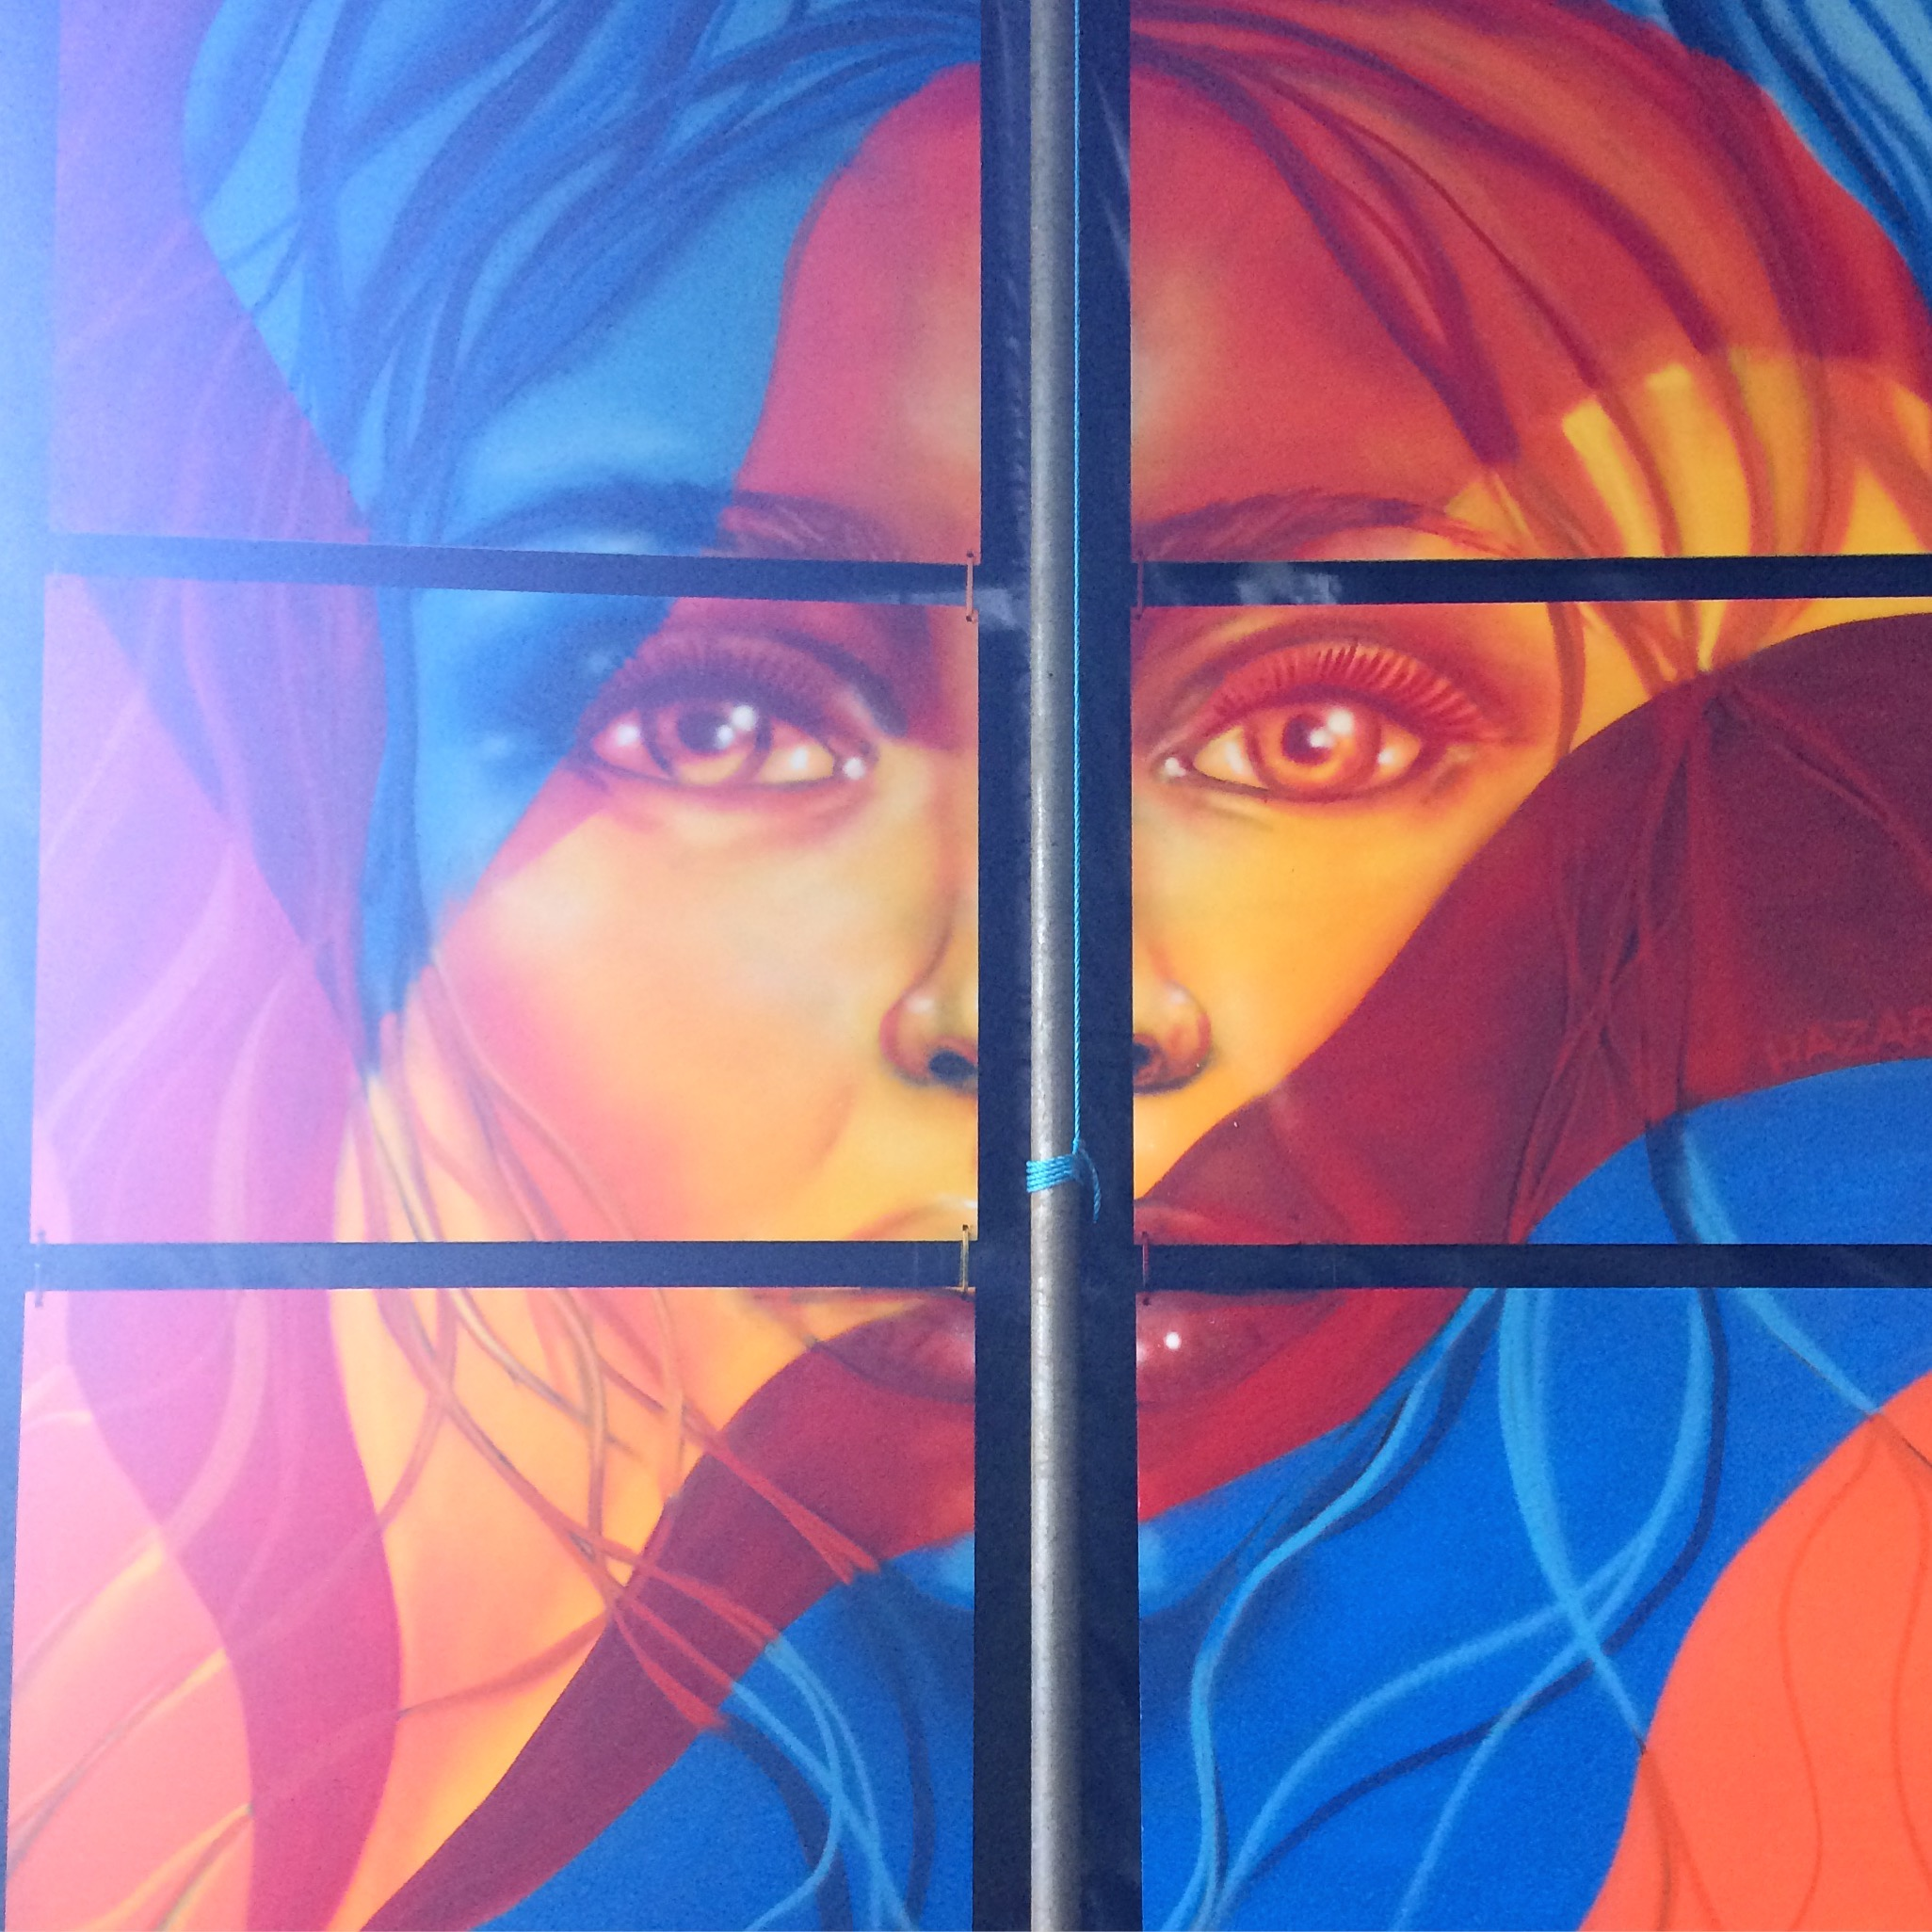 Glastonbury_Panel_Closeup_2017.jpg